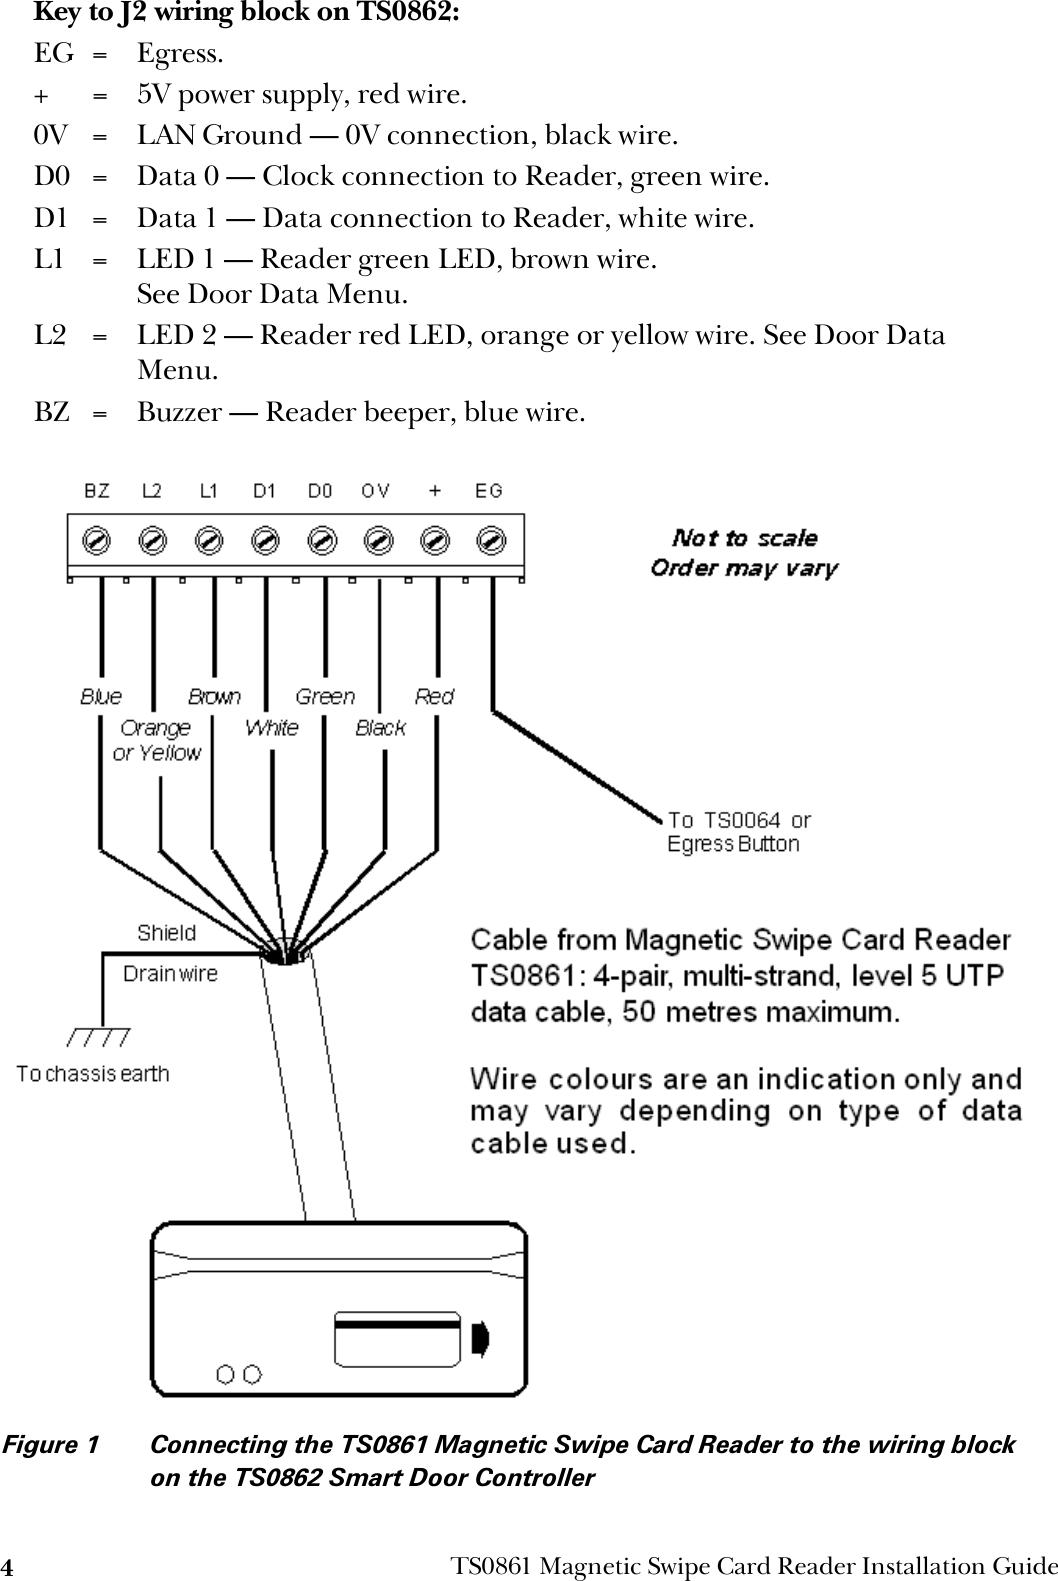 magnetic card wiring diagram ge appliances magnetic swipe card reader ts0861 users manual  ge appliances magnetic swipe card